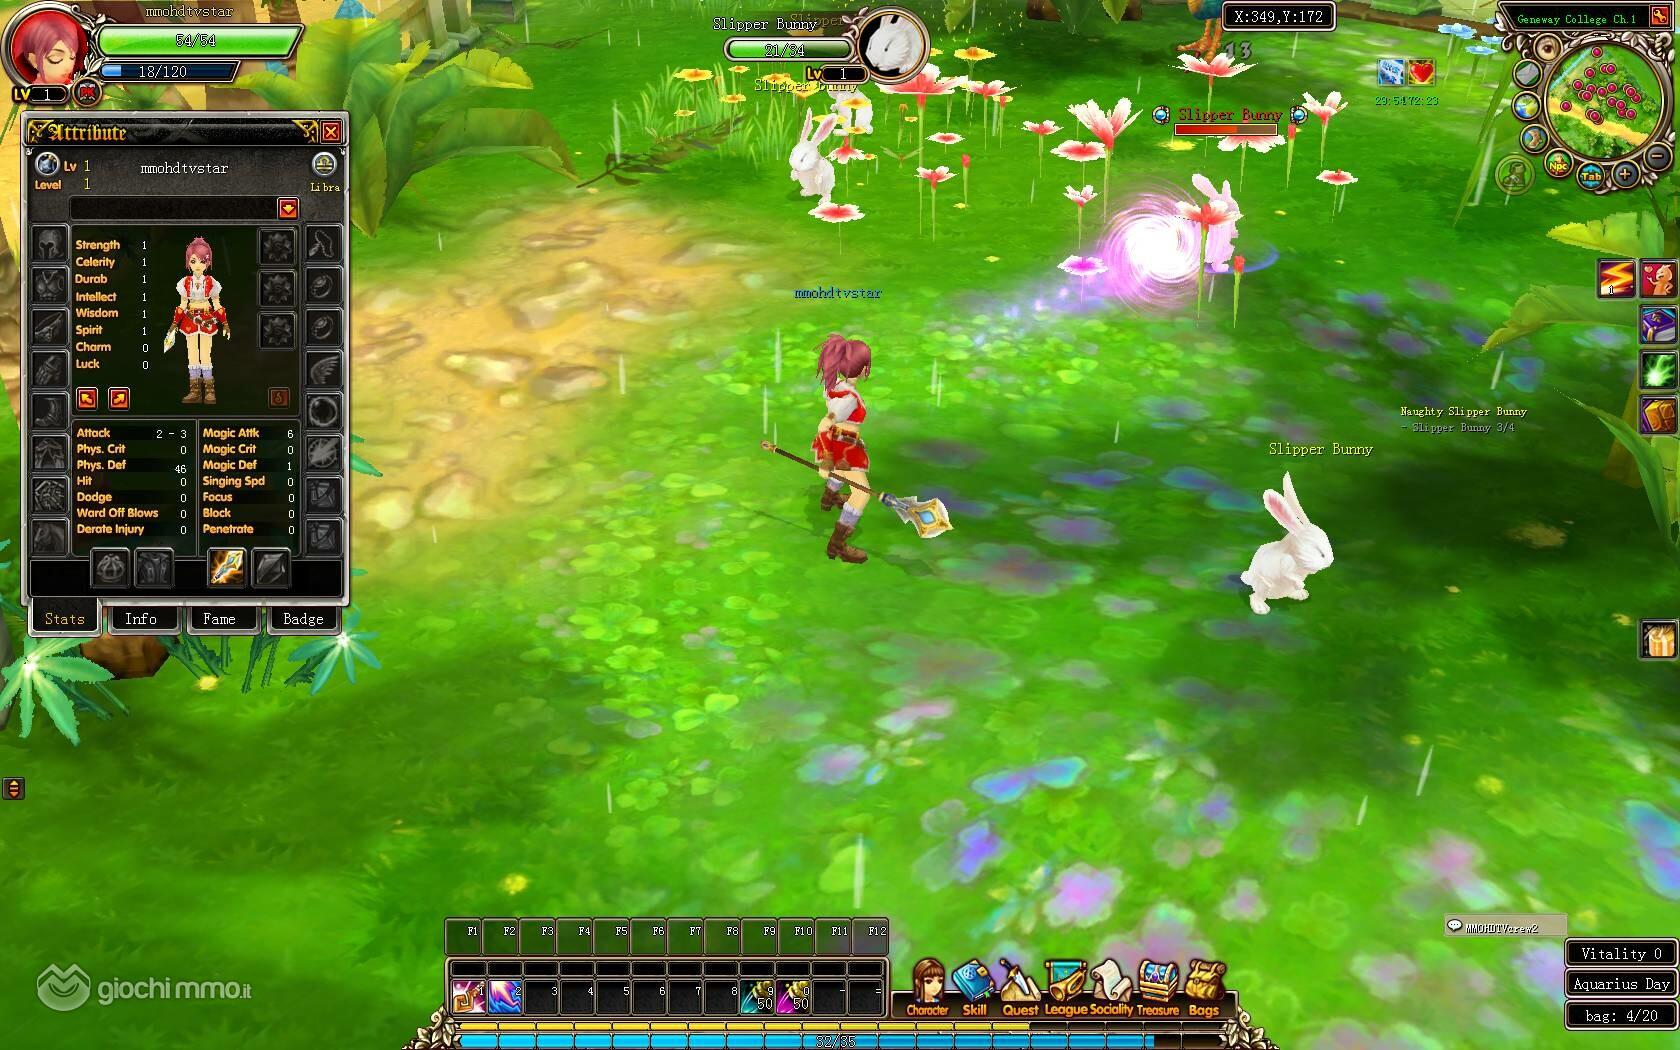 Clicca sull'immagine per ingrandirlaNome:   Luvinia Online screen07.jpgVisite: 51Dimensione:   392.9 KBID: 8855